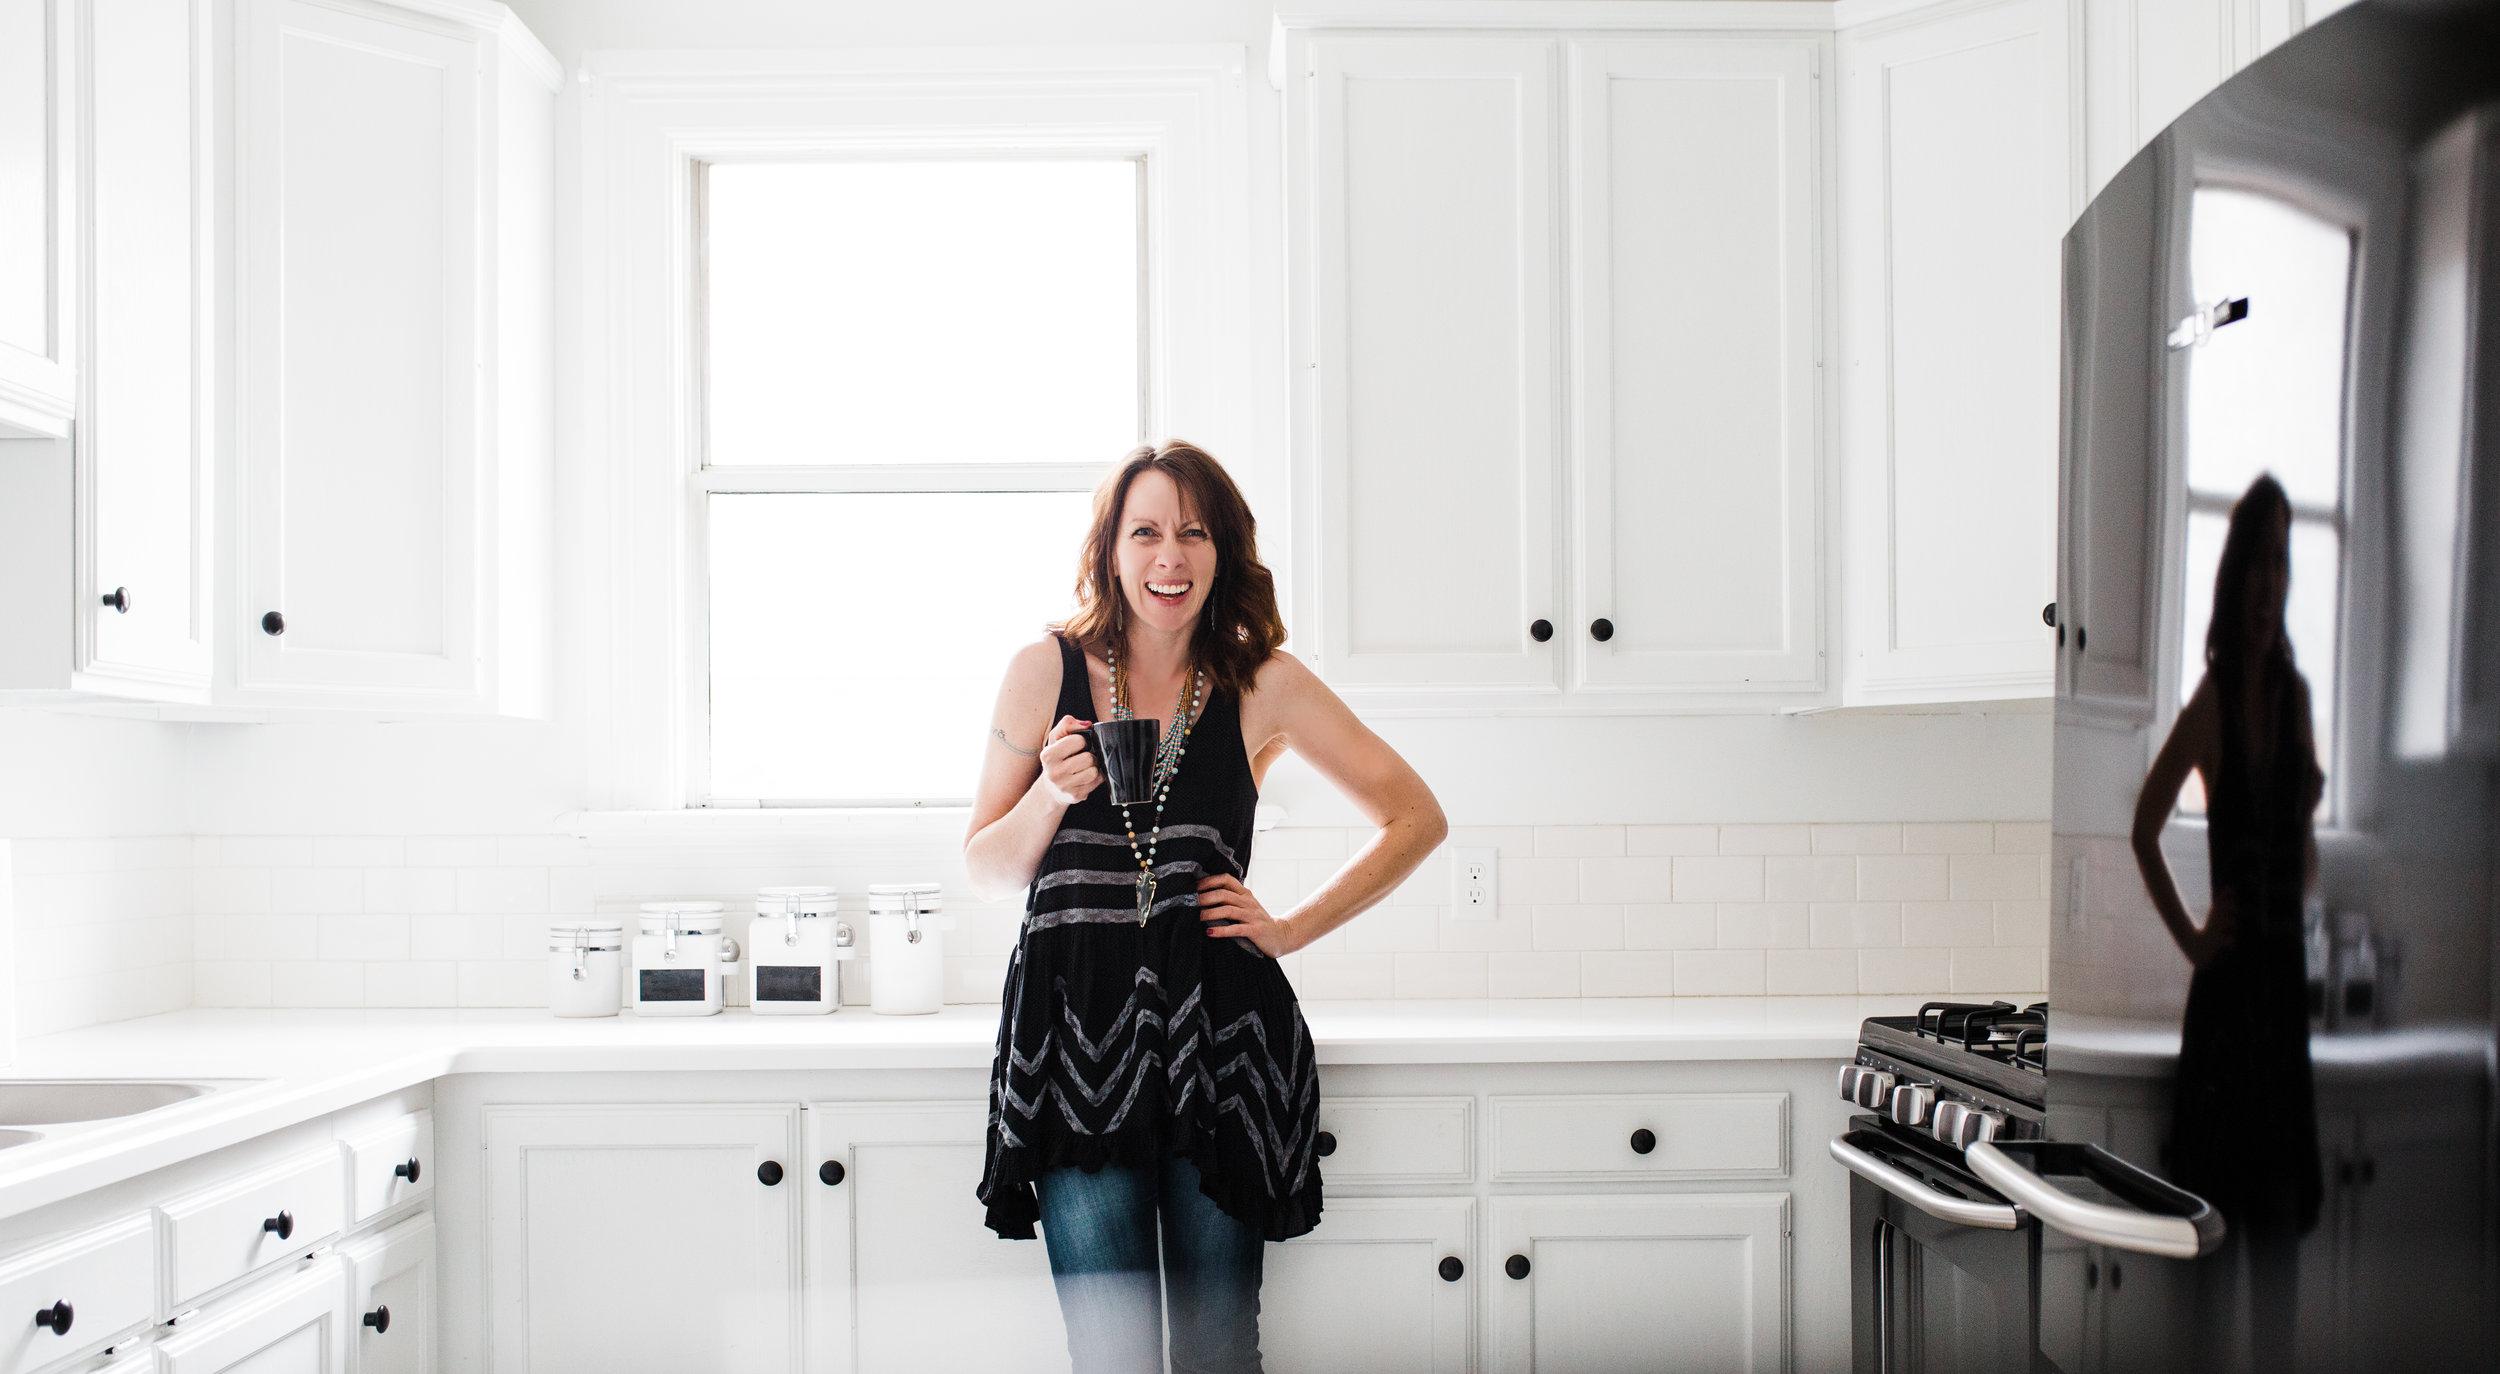 2018-03 Brooke Shots Airbnb 11FFFF.jpg